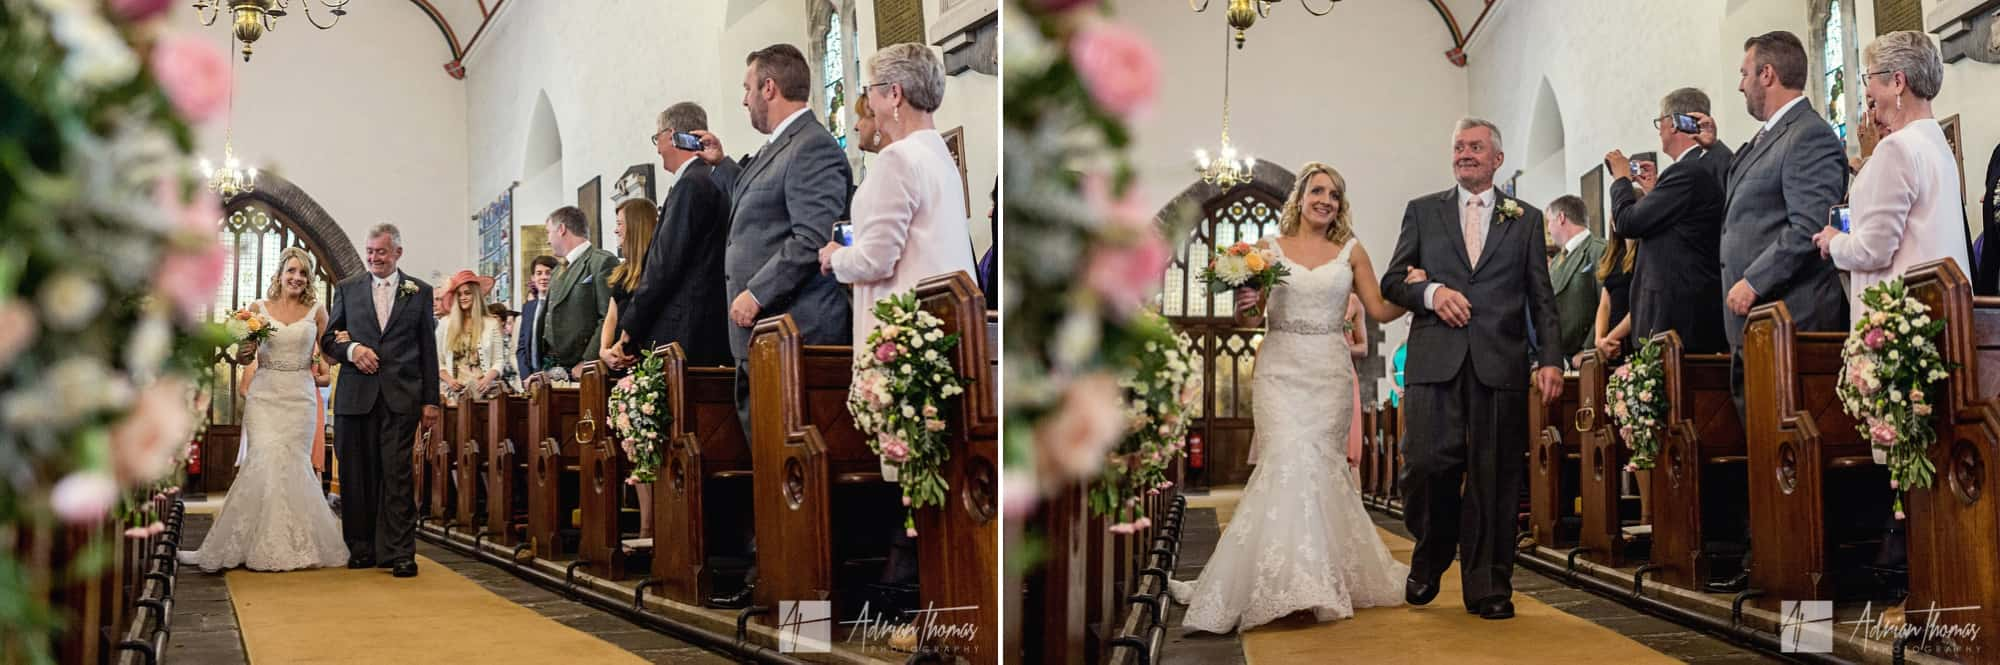 Bride and dad walking down church isle.